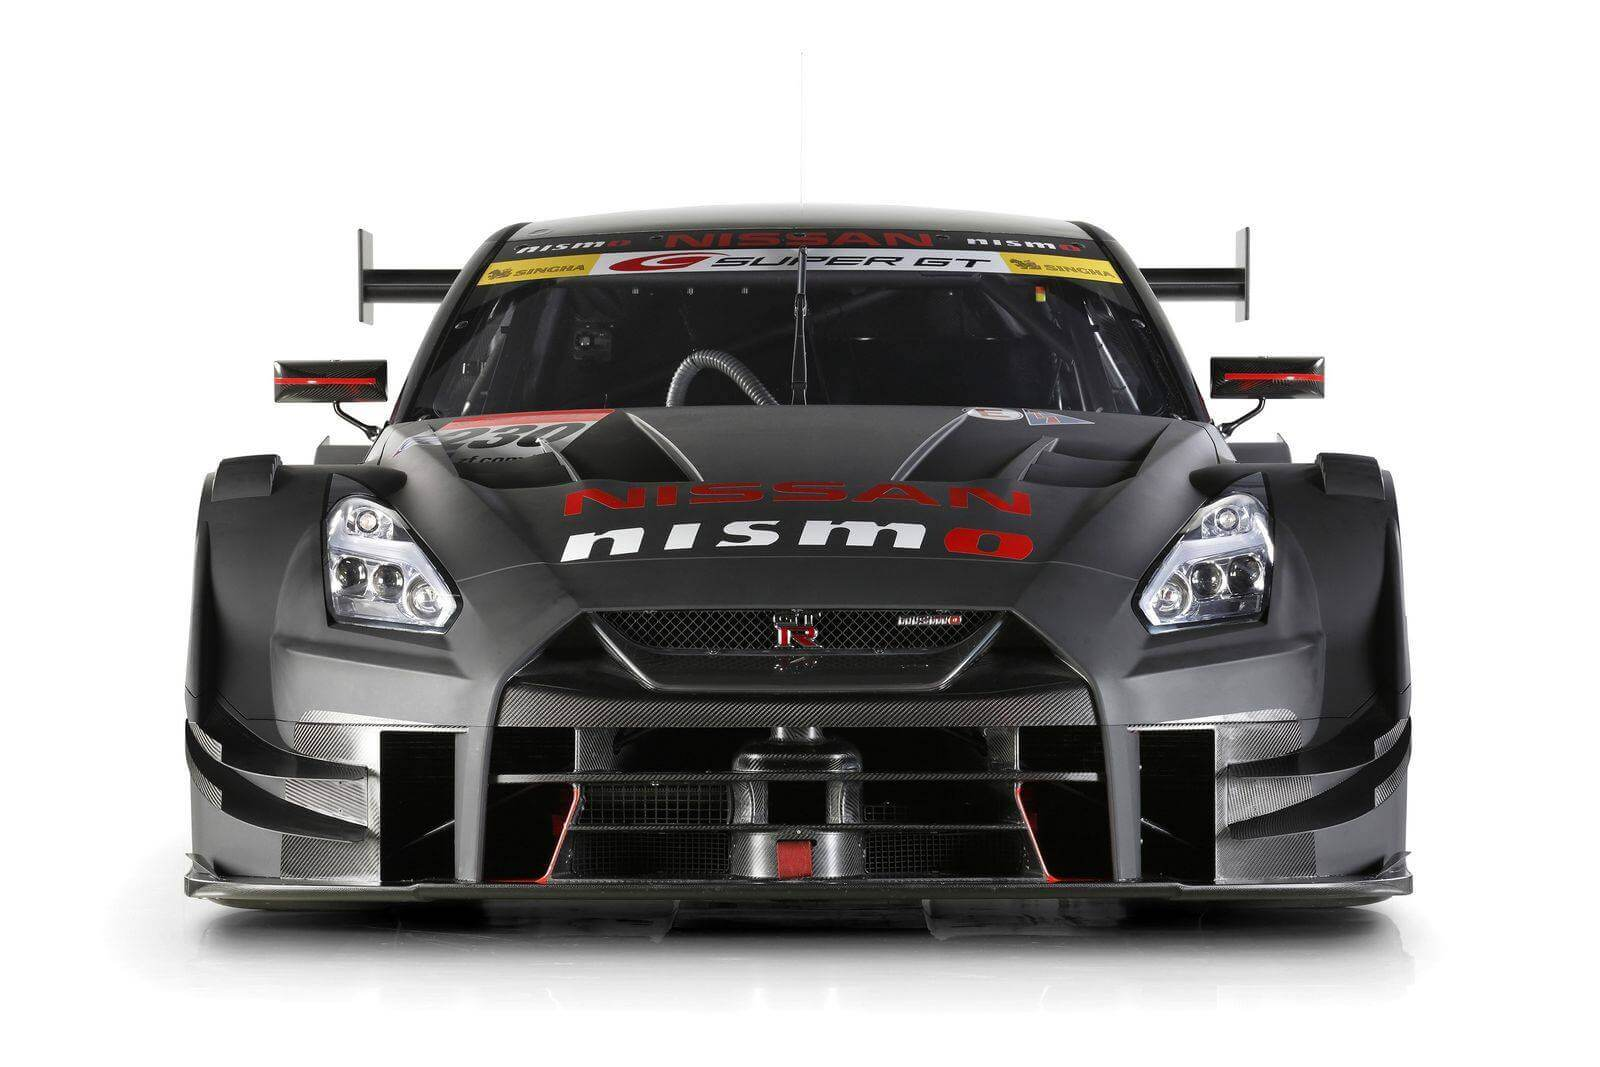 Nissan-GT-R-Nismo-GT-nissan-gtr-motorsport-wallpaper-wp580768